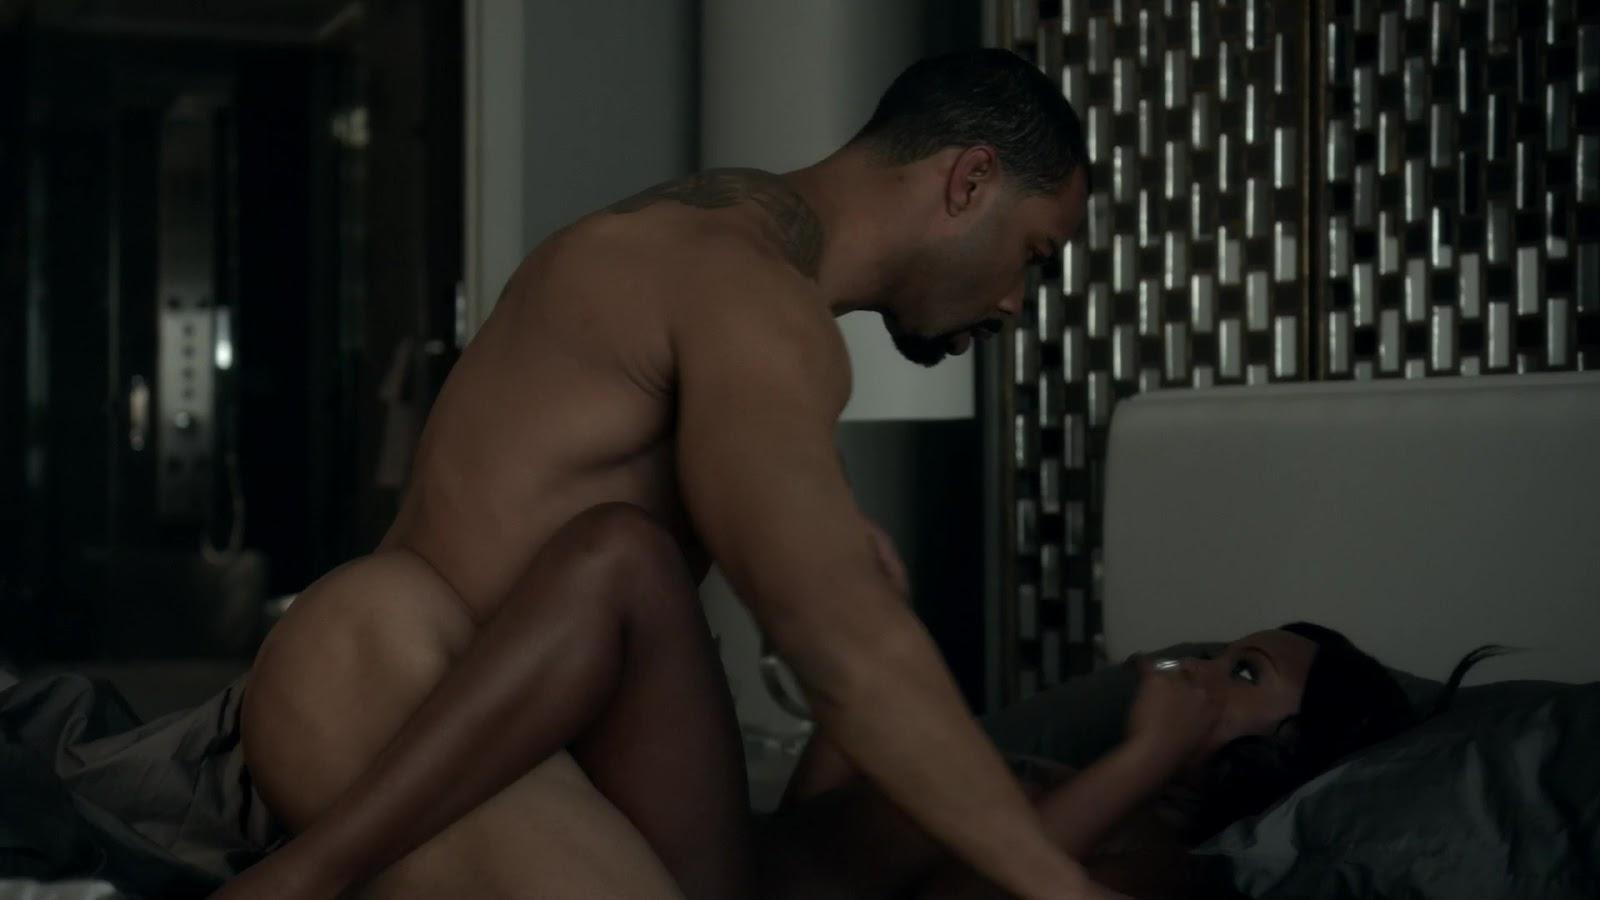 Auscaps Omari Hardwick Nude In Power 1-01 -2209